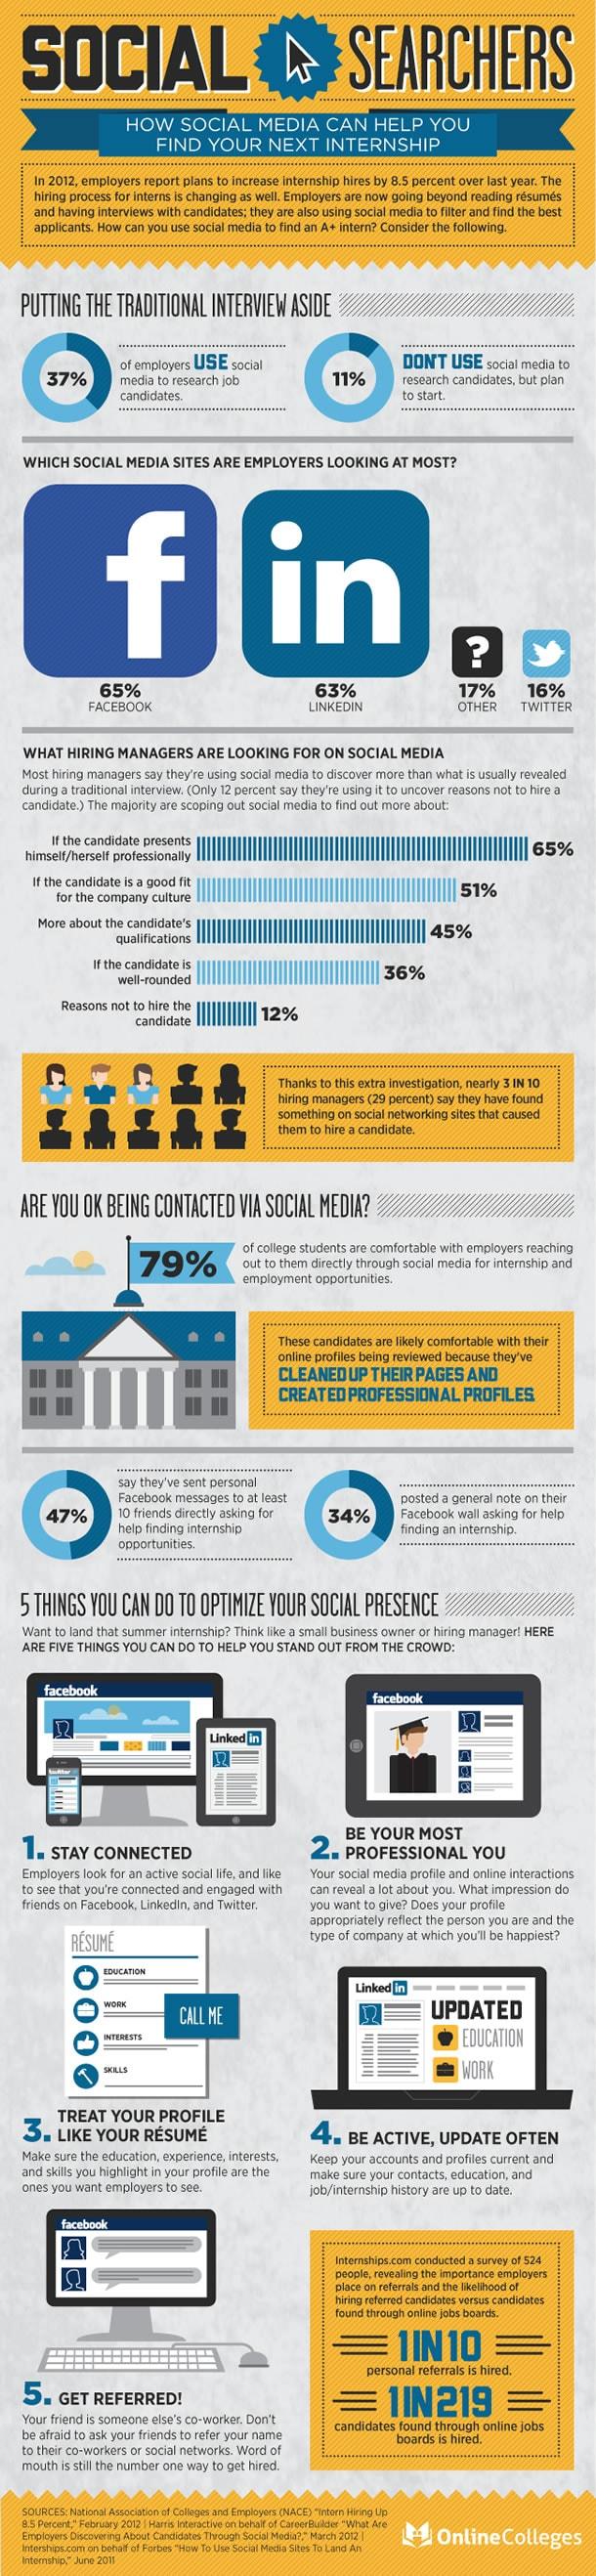 how to get your first job gradudate social media